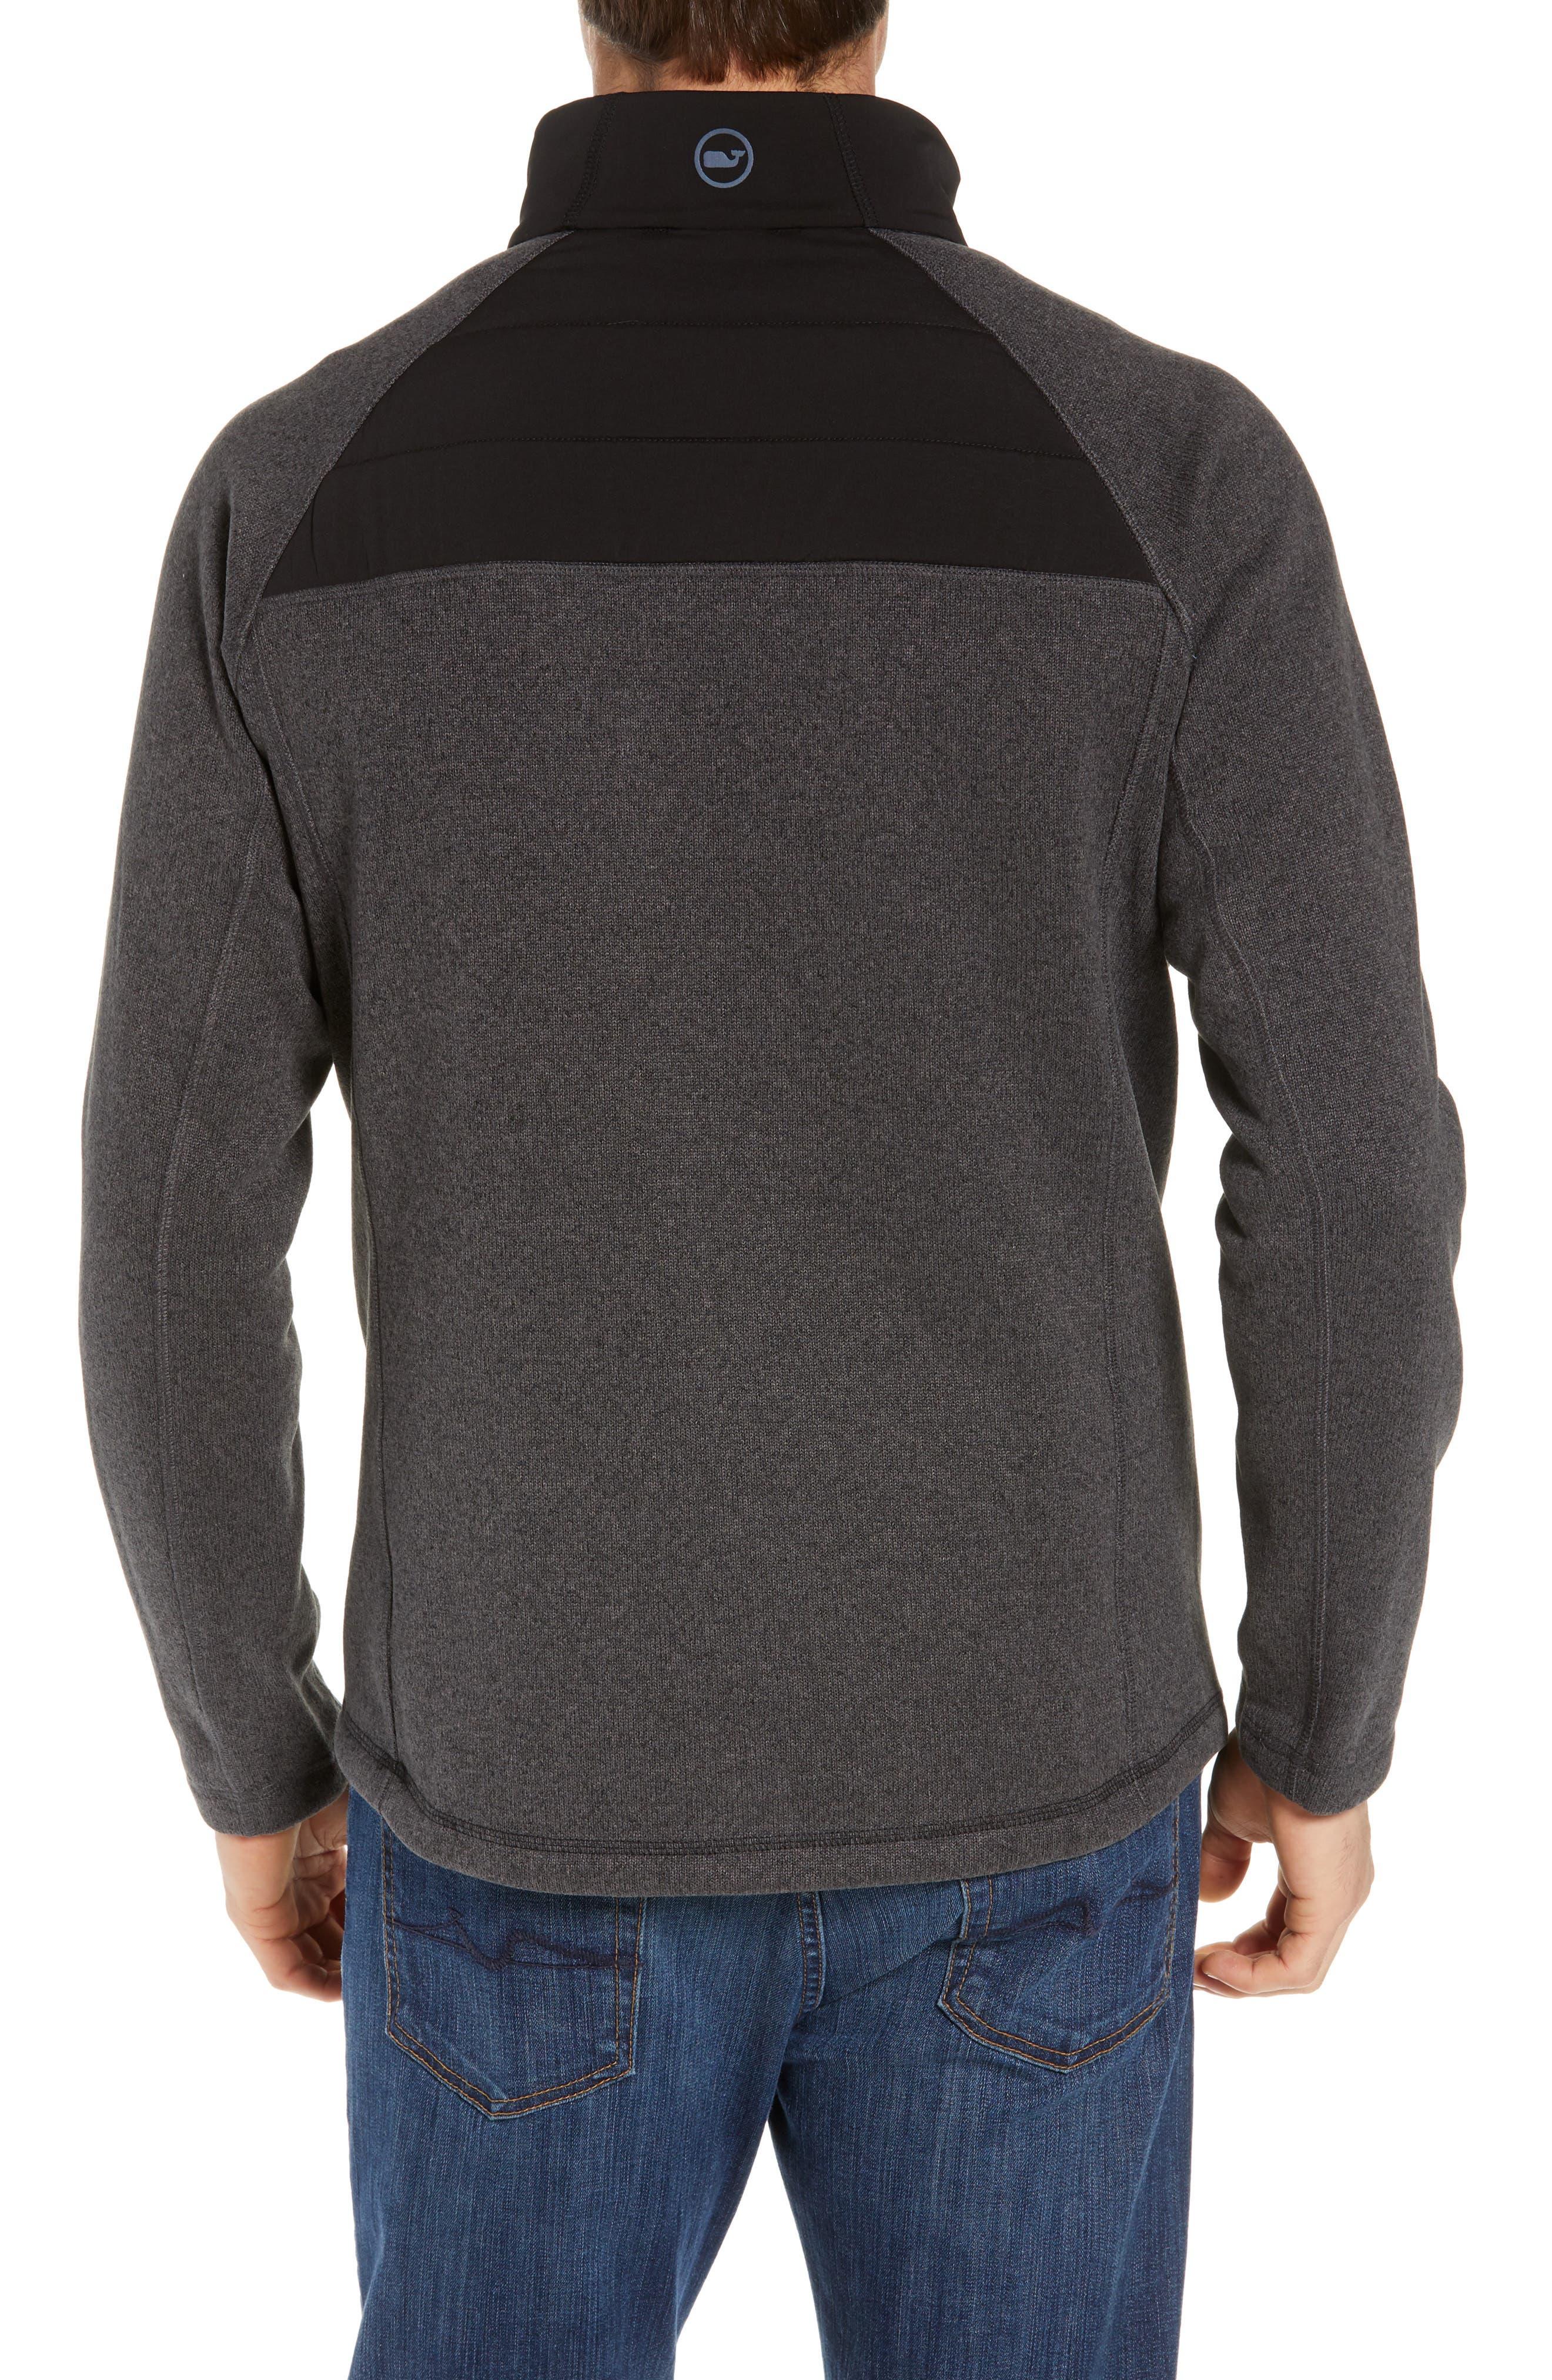 Seaward Fleece Half Zip Pullover,                             Alternate thumbnail 2, color,                             NOCTURNE